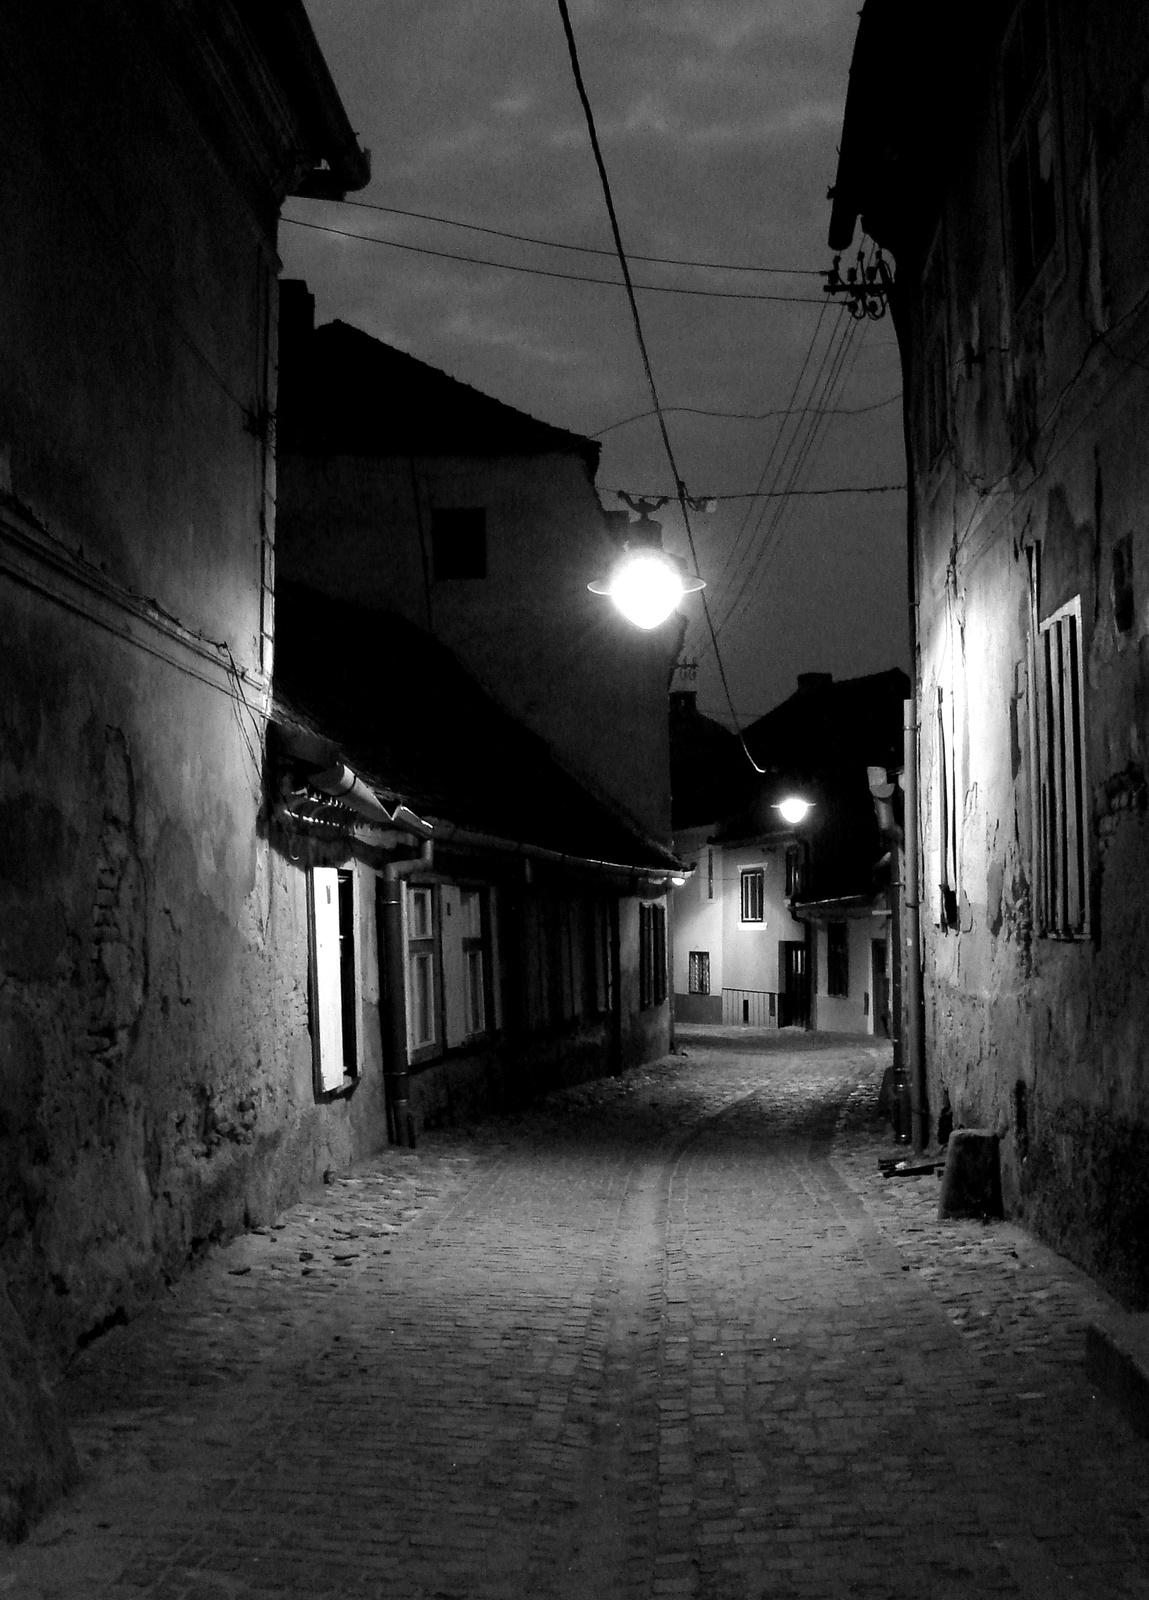 régi utca